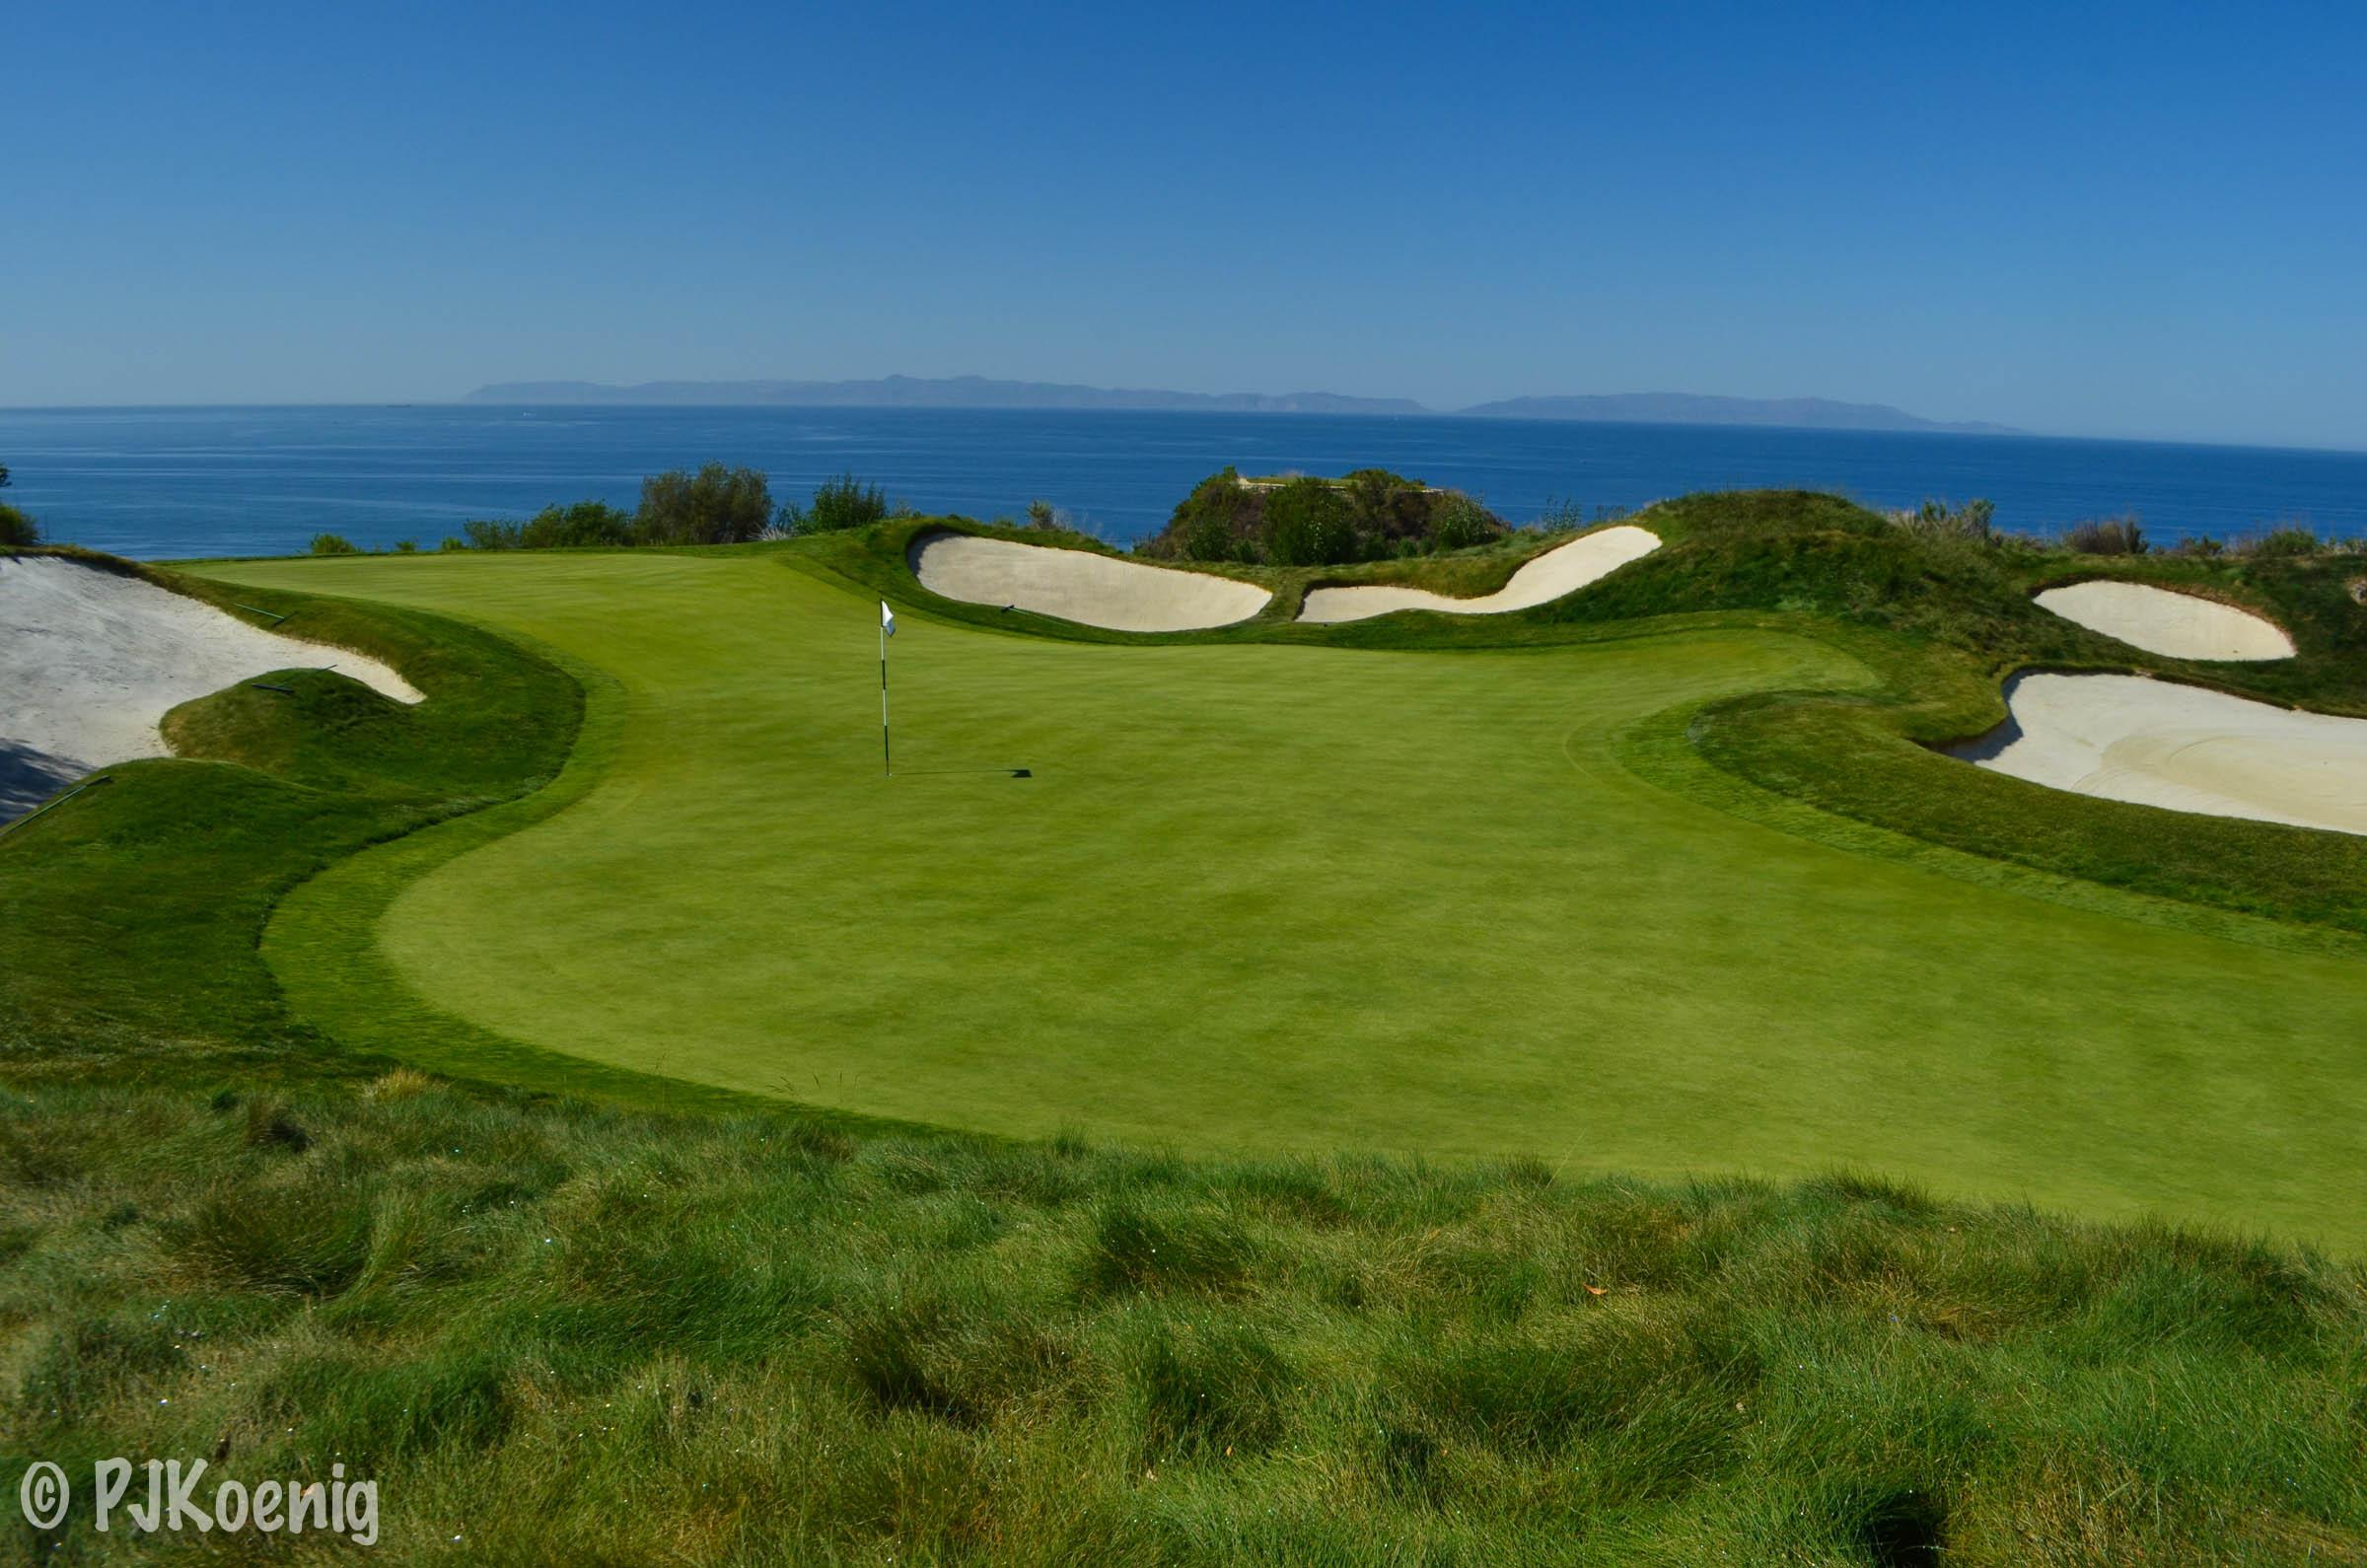 Trump National Golf Club - Rancho Palos Verdes, CA